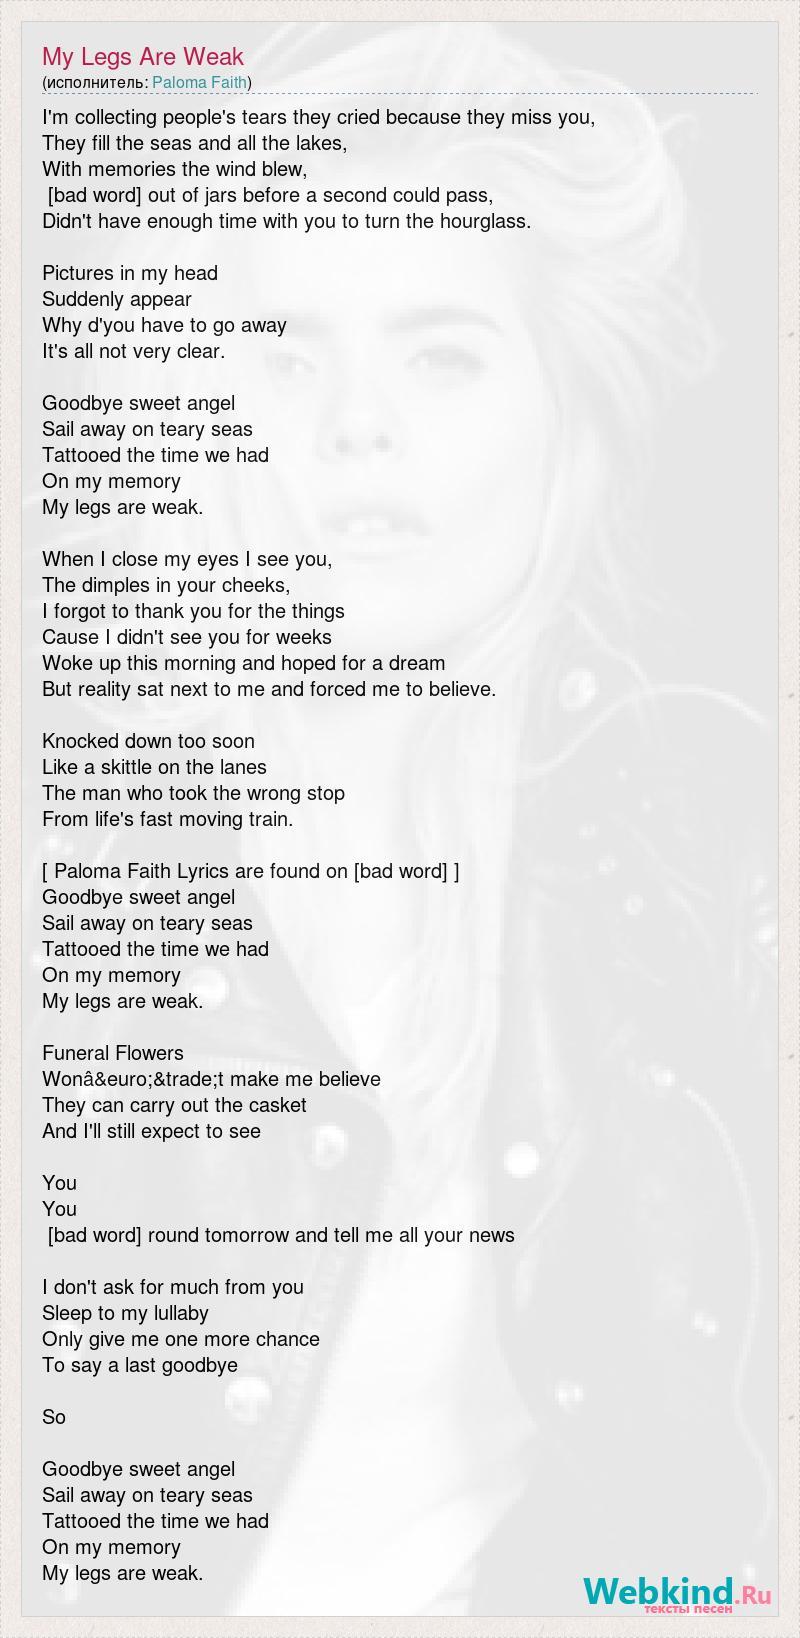 Paloma Faith: My Legs Are Weak слова песни